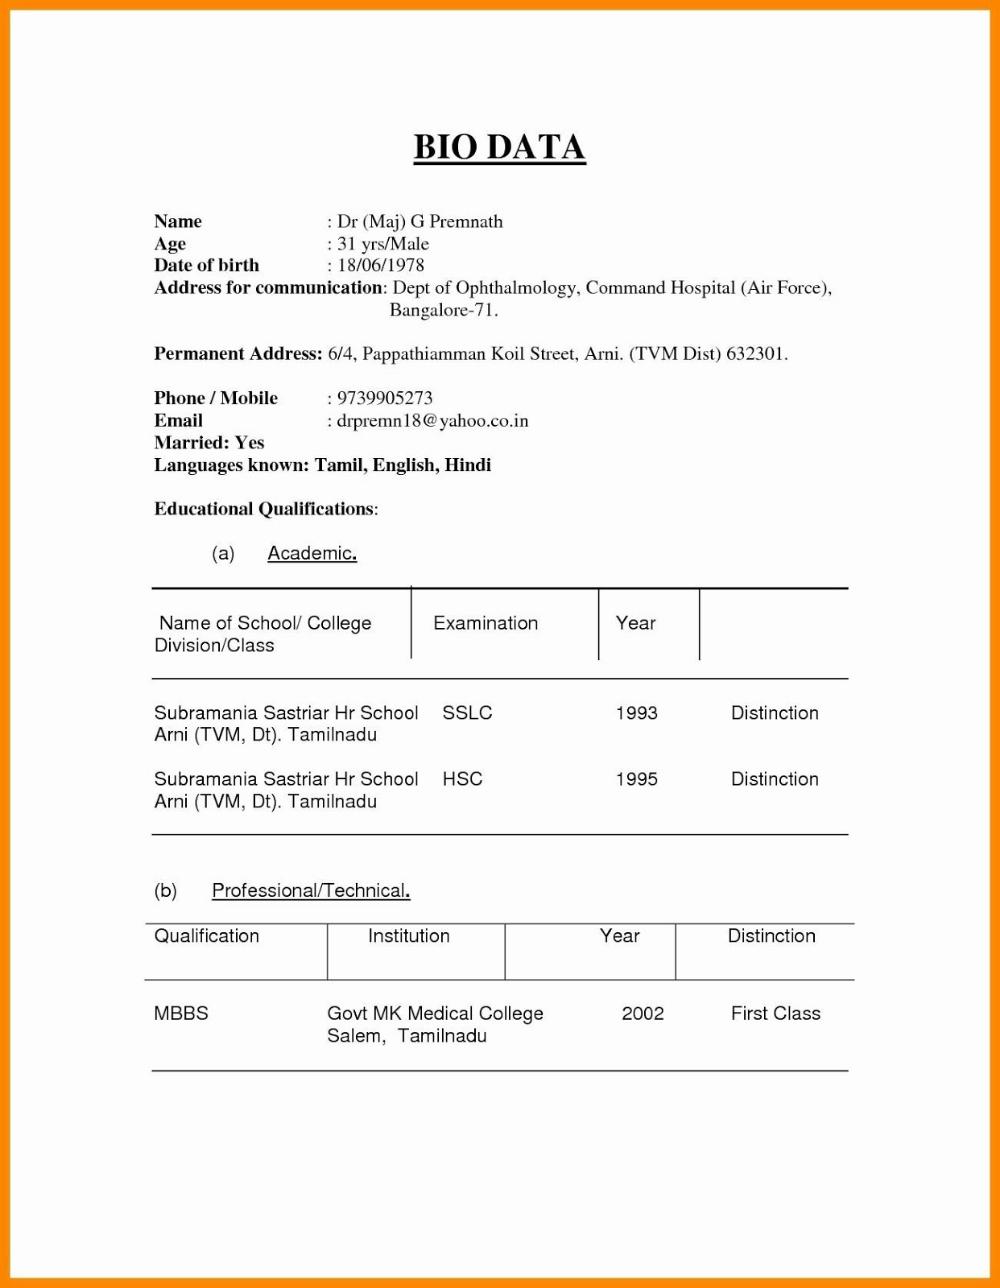 Marriage Resume Format Marriage Resume Format For Girl In Word Marriage Resume Format For Boy Marr In 2020 Biodata Format Download Bio Data For Marriage Biodata Format